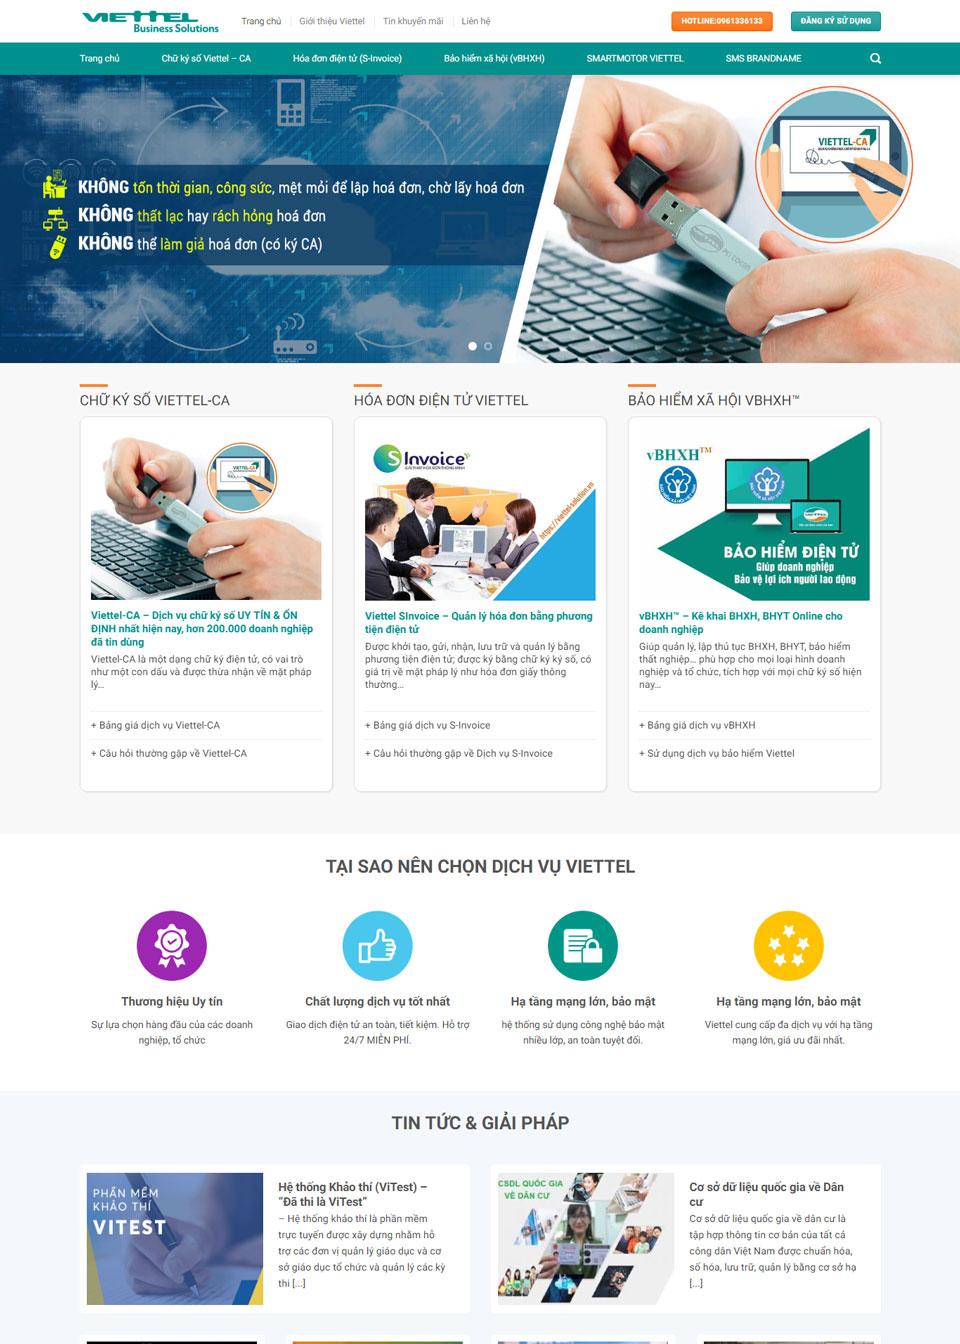 Website Viettel-solution.vn